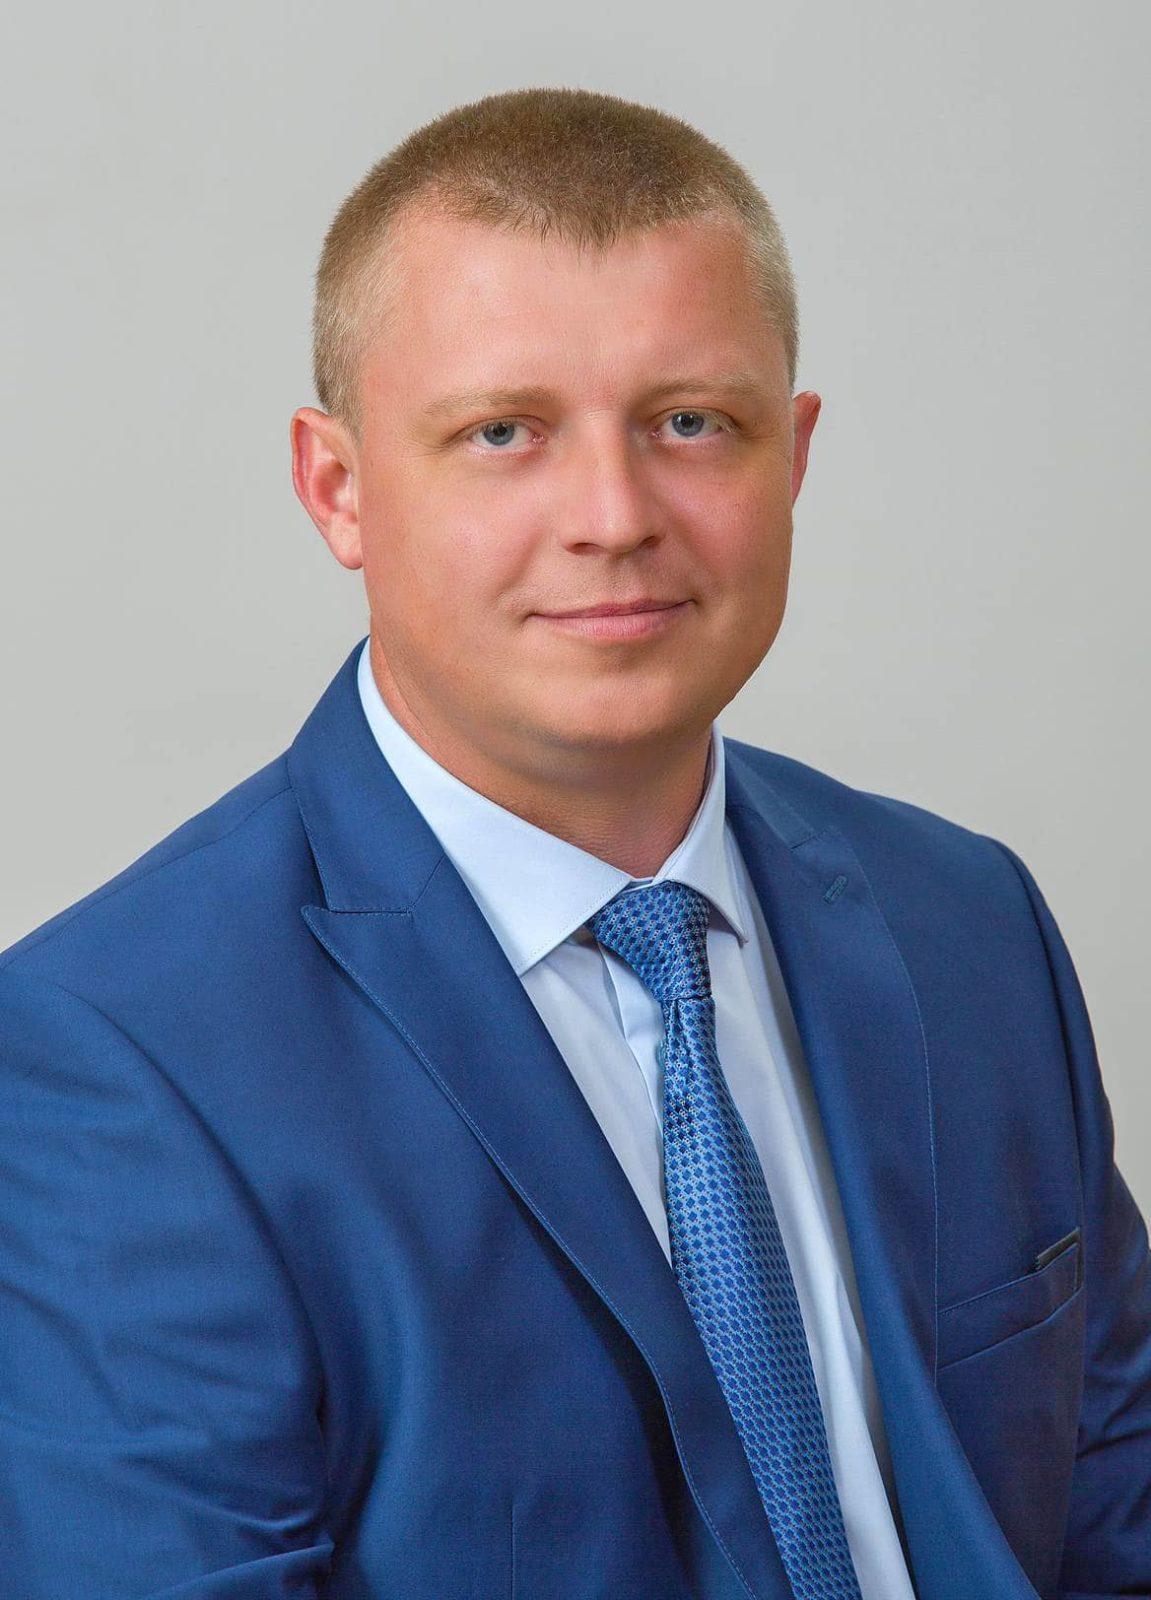 bondarenko sergej vladimirovich - БОНДАРЕНКО Сергей Владимирович